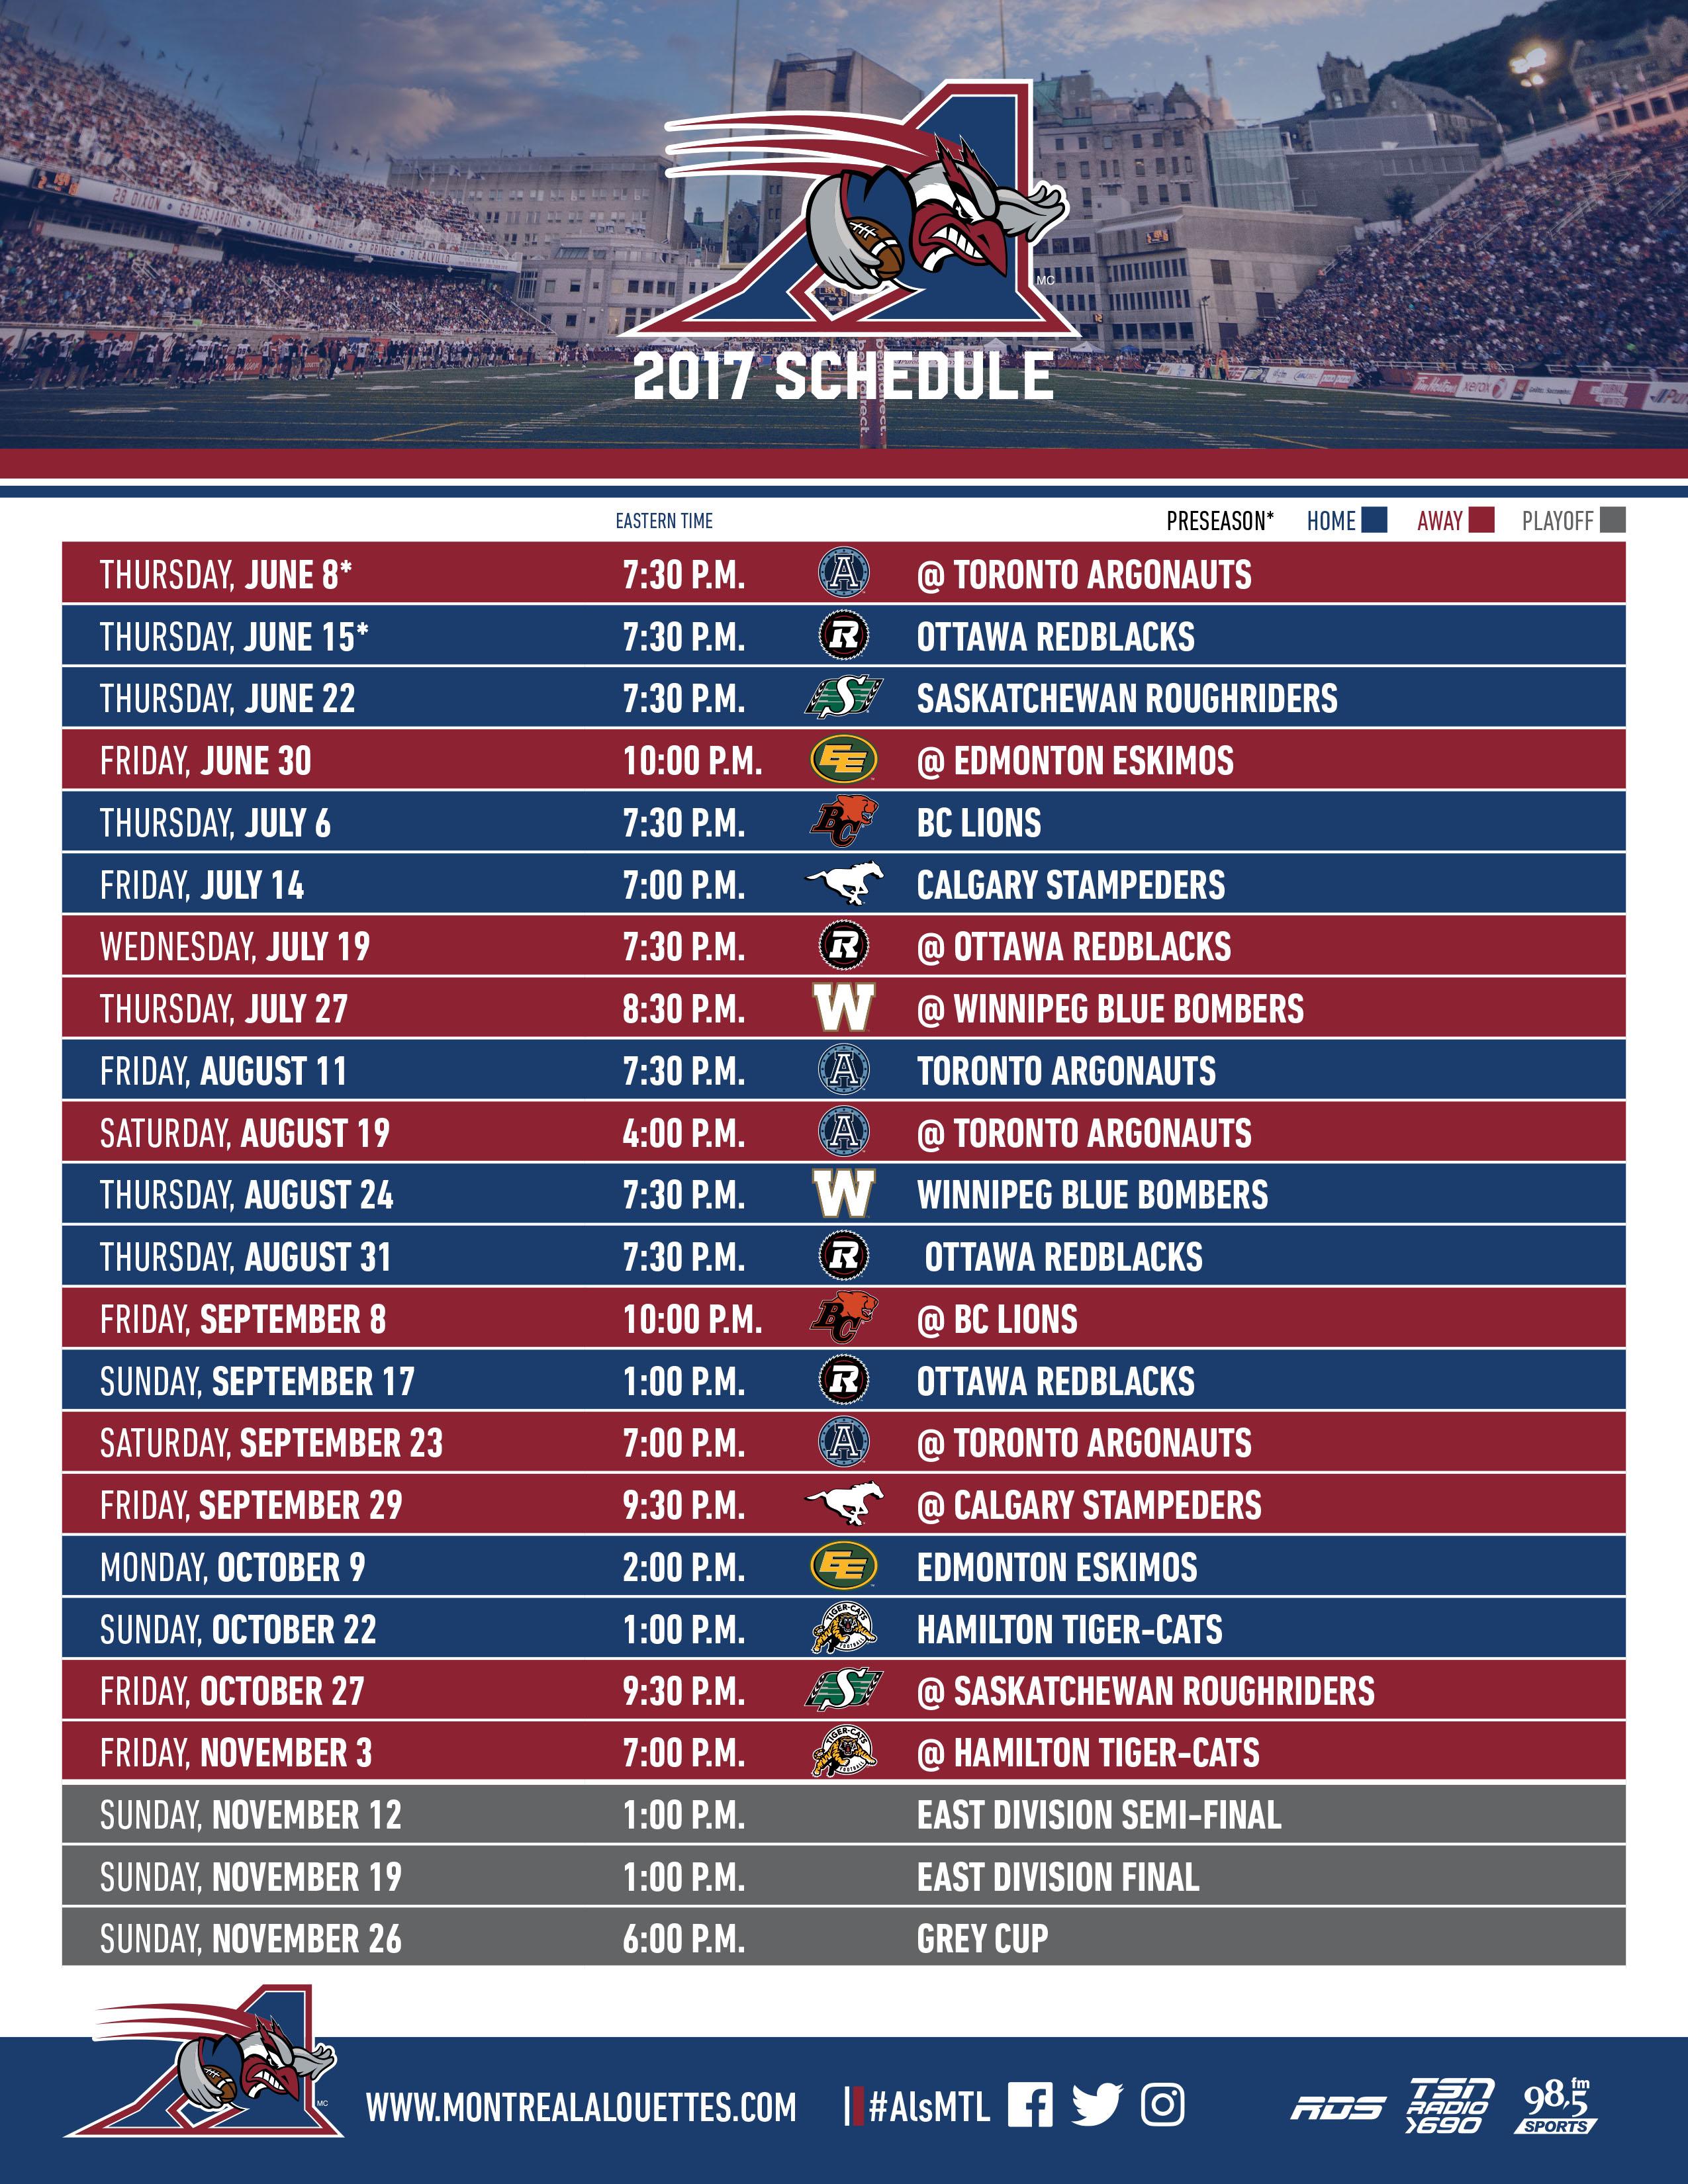 winnipeg jets schedule 2017 pdf